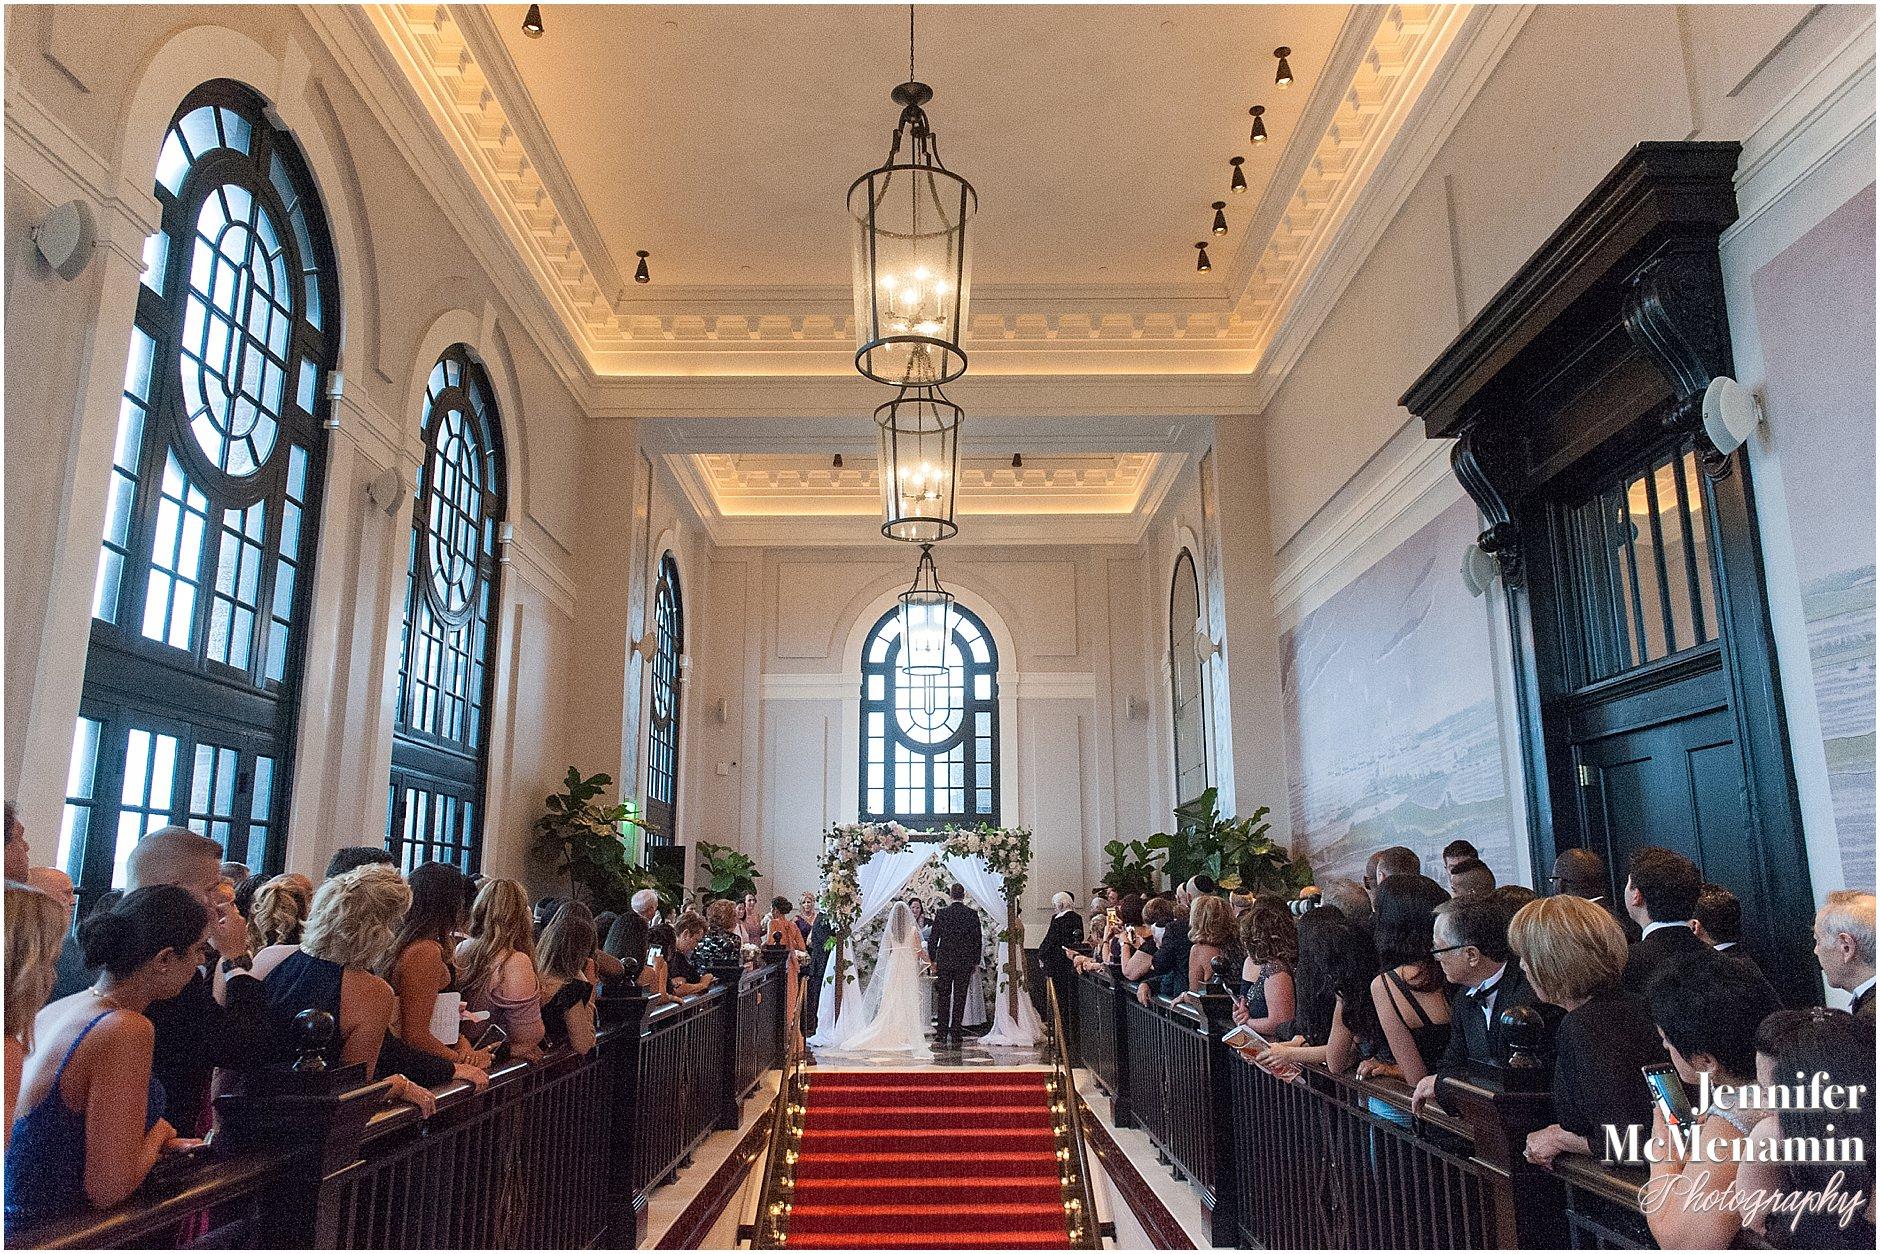 Jennifer-McMenamin-Photography-Sagamore-Pendry-wedding_0969.jpg